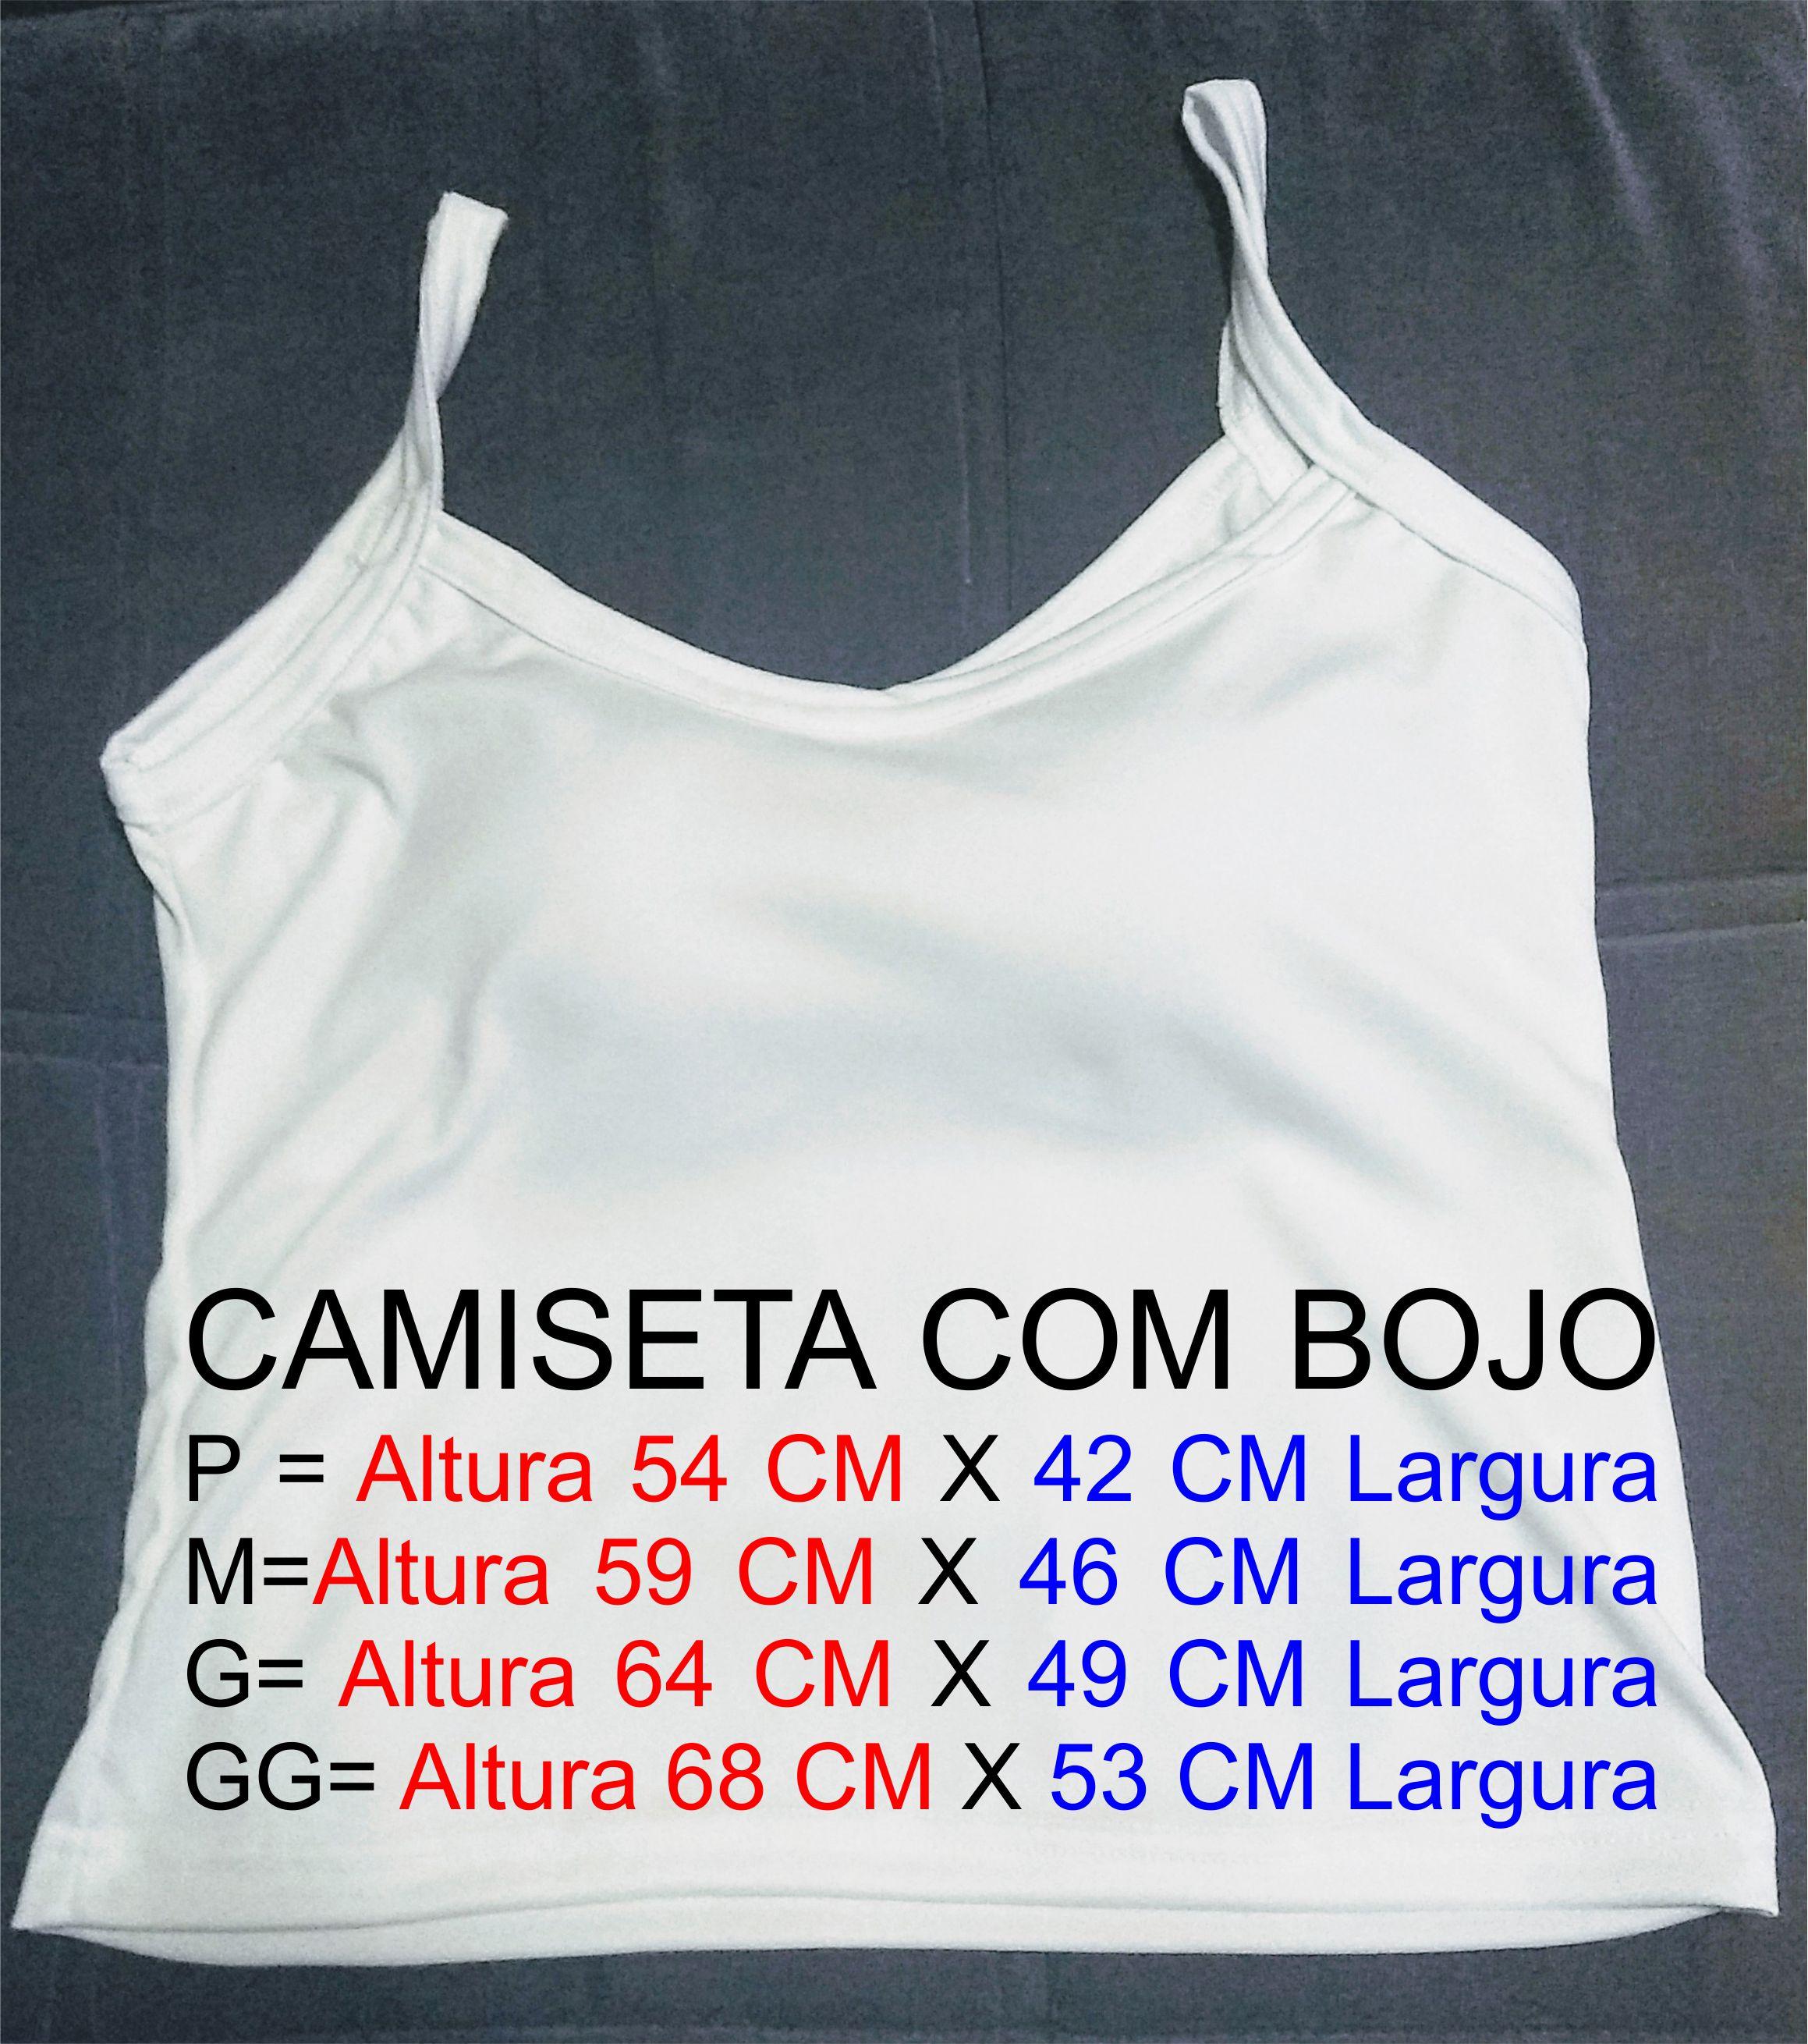 4fe9f59857 Camisa feminina com bojo no Elo7